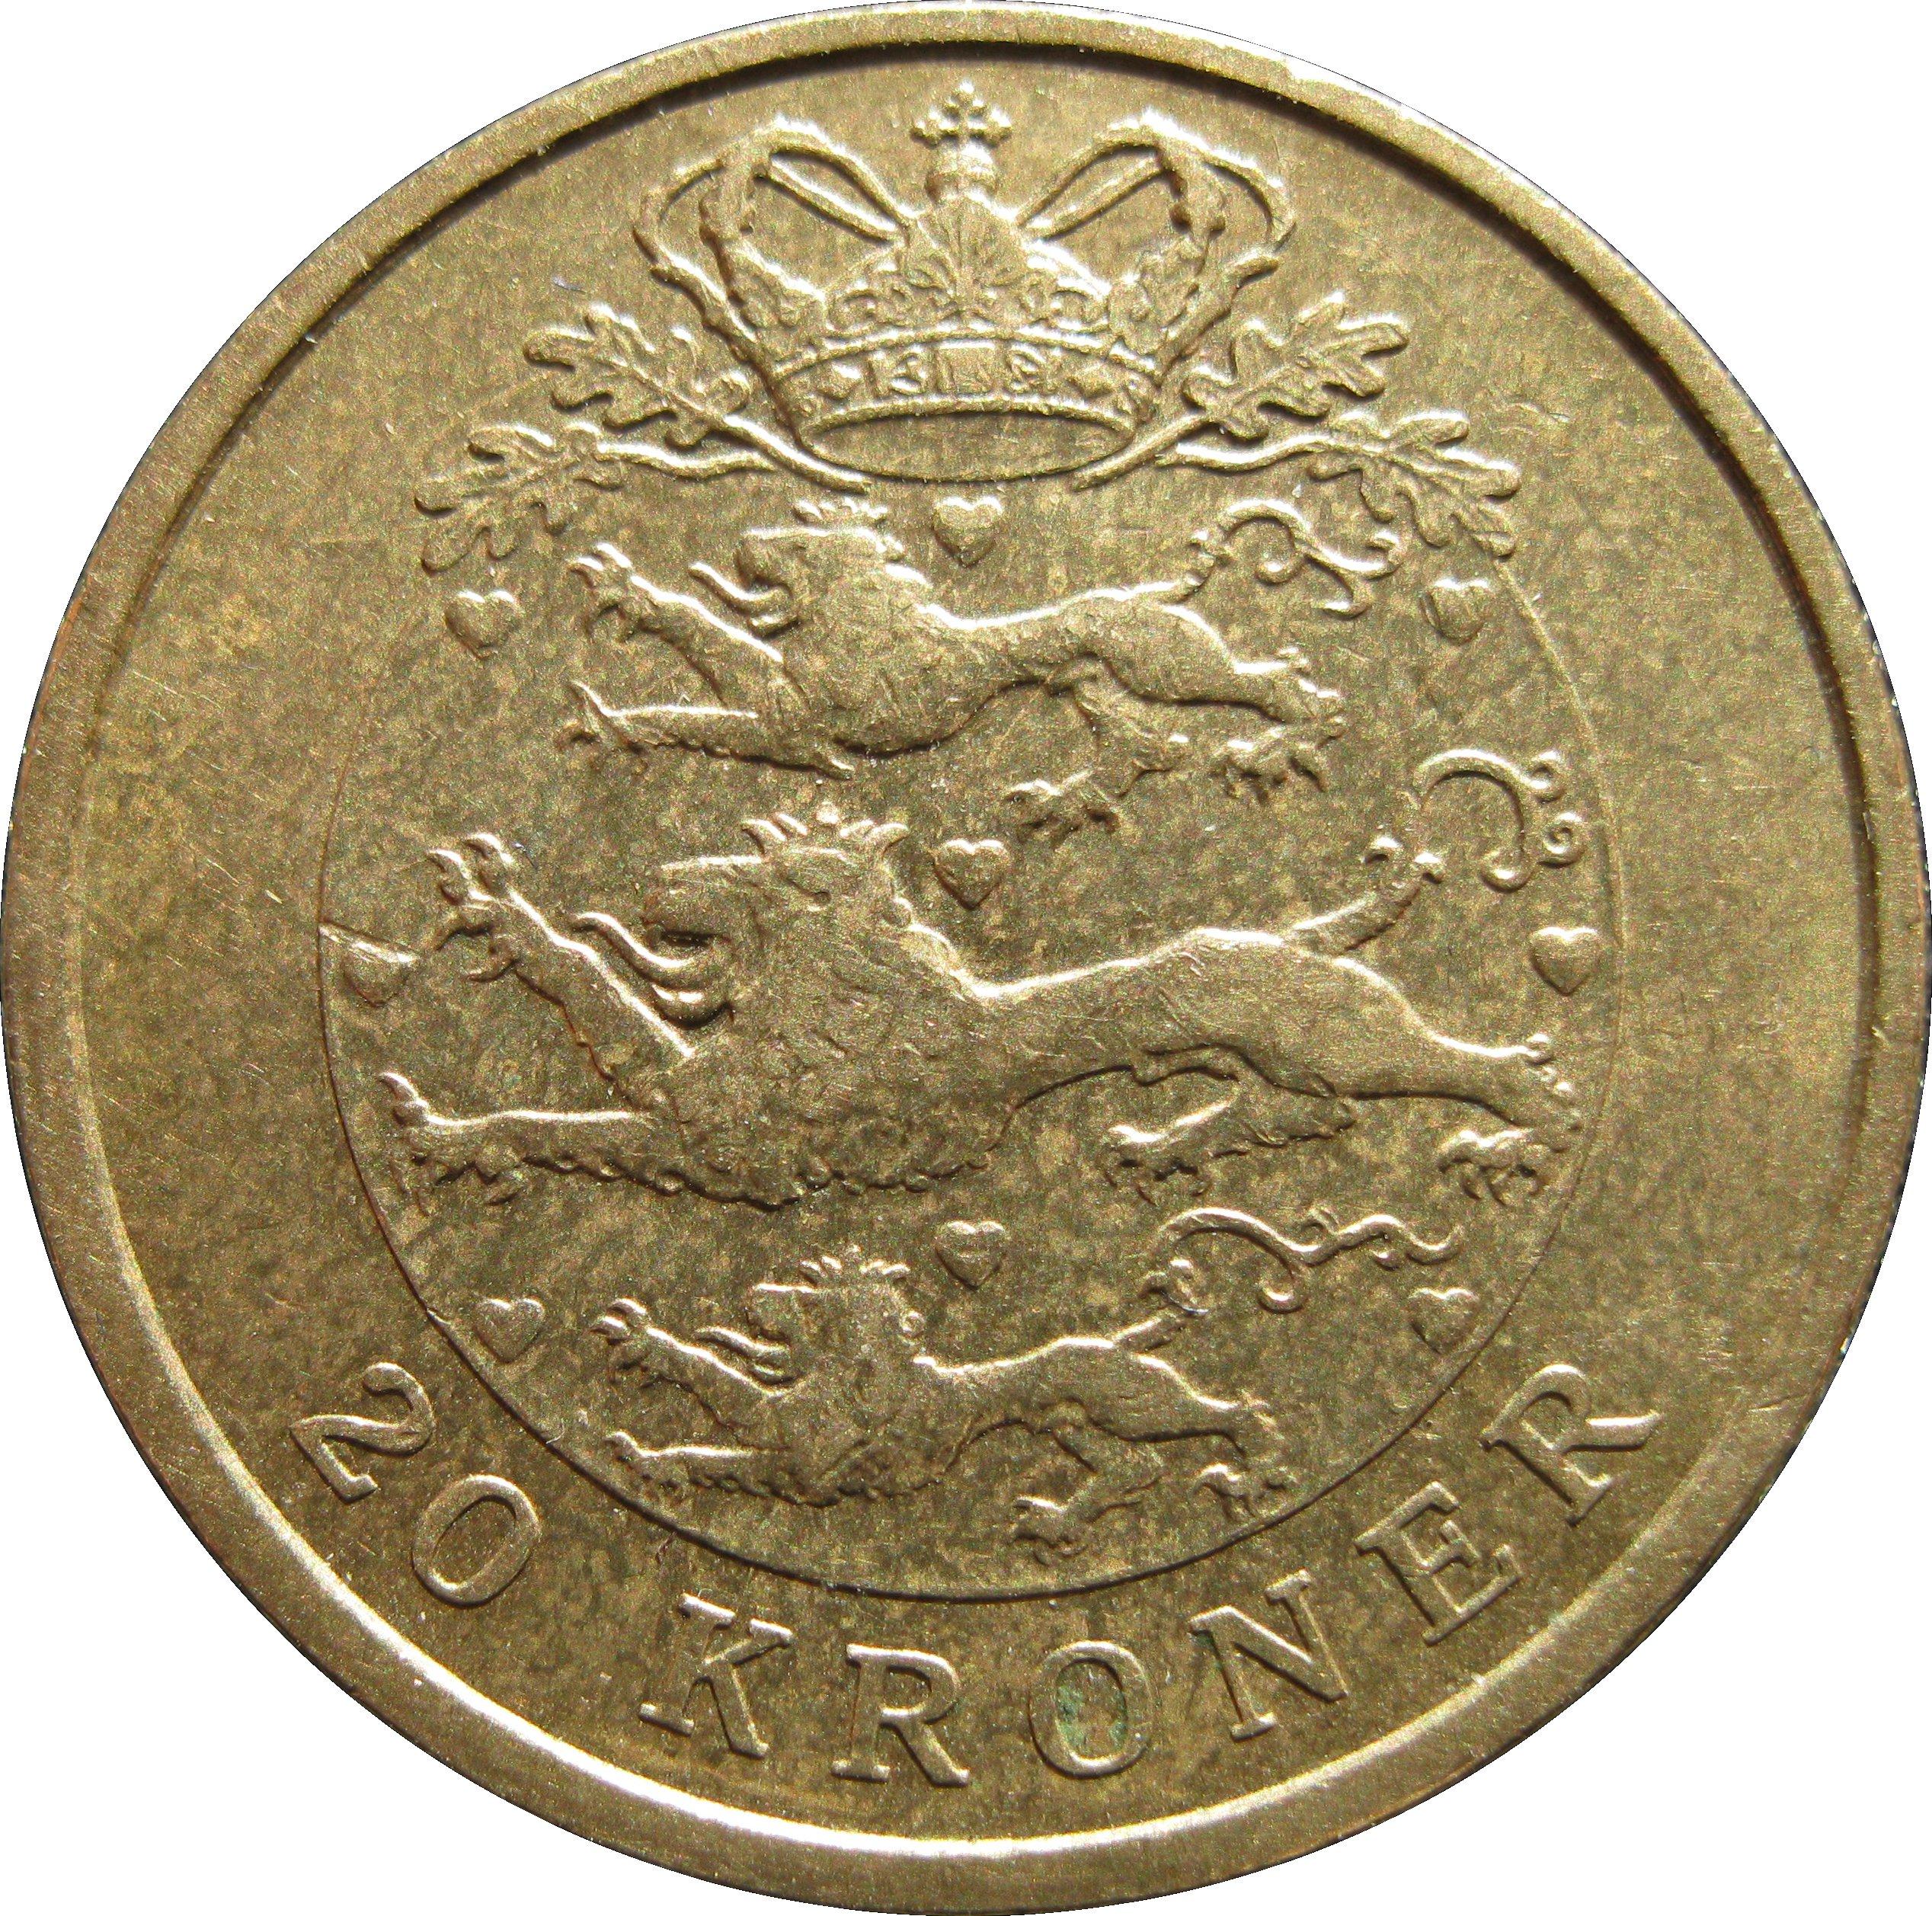 20 kroner - margrethe ii  4e effigie  2e armoiries